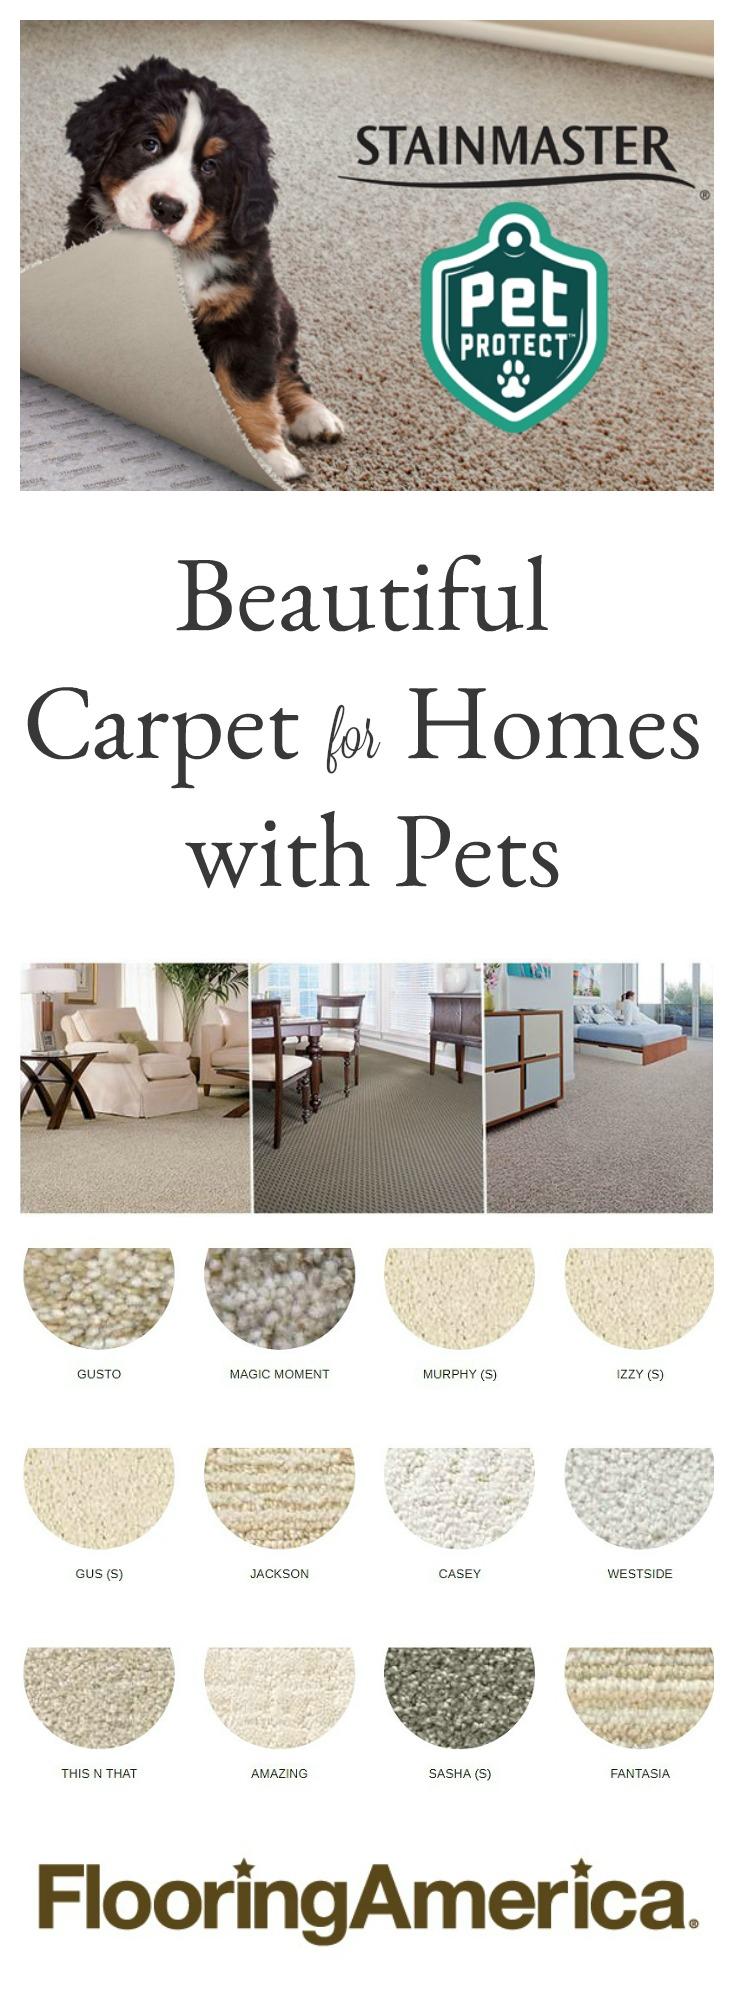 Flooring America Stainmater Petprotect Carpet - Pet & Kid Friendly Carpet, Finally! sponsored pin